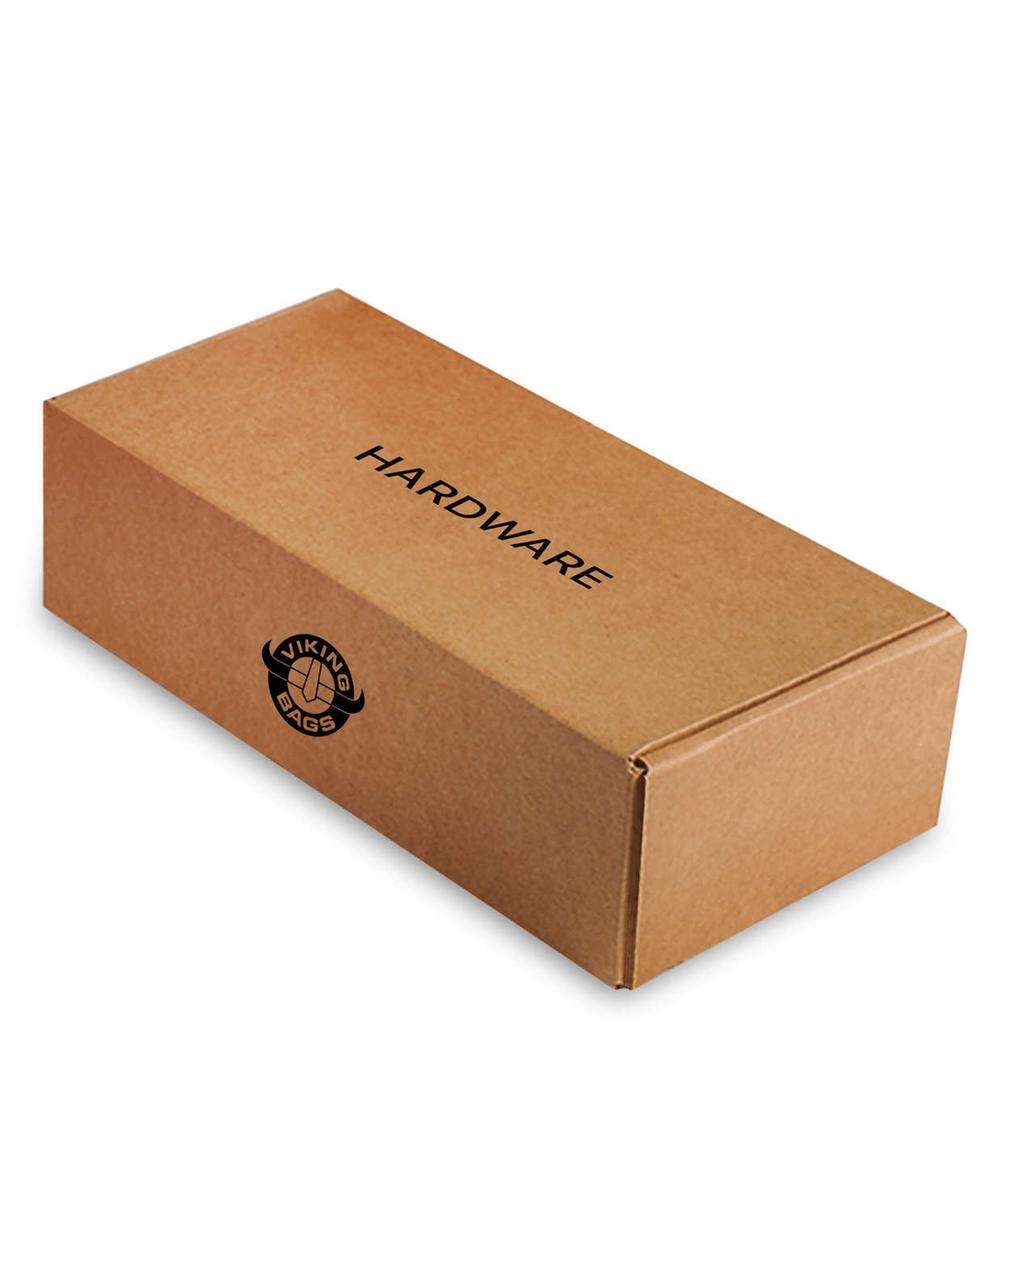 Honda VTX 1800 C Slanted Medium Motorcycle Saddlebags Box